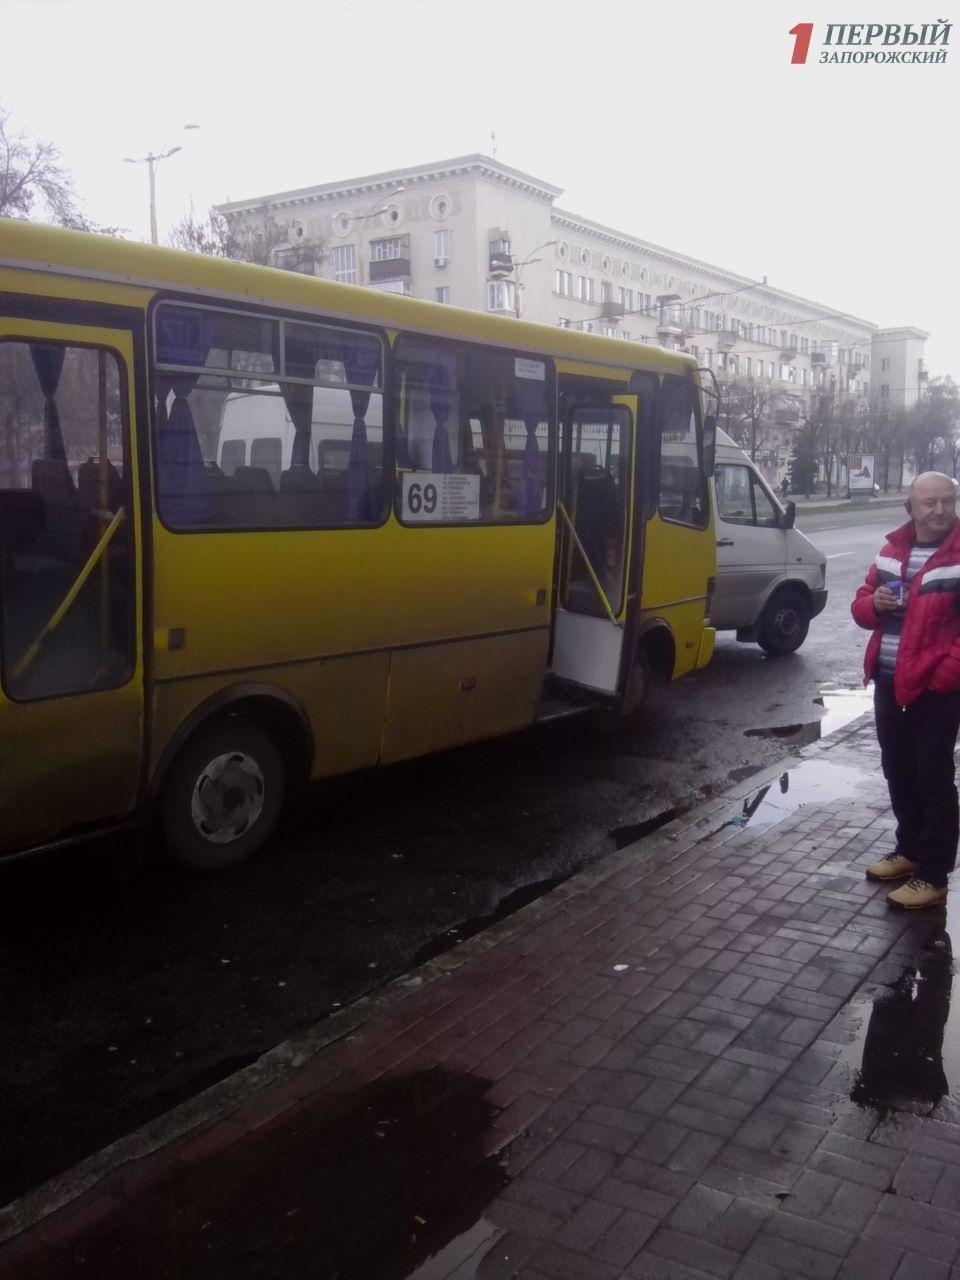 В центре Запорожья столкнулись две маршрутки с пассажирами, - ФОТО, фото-3